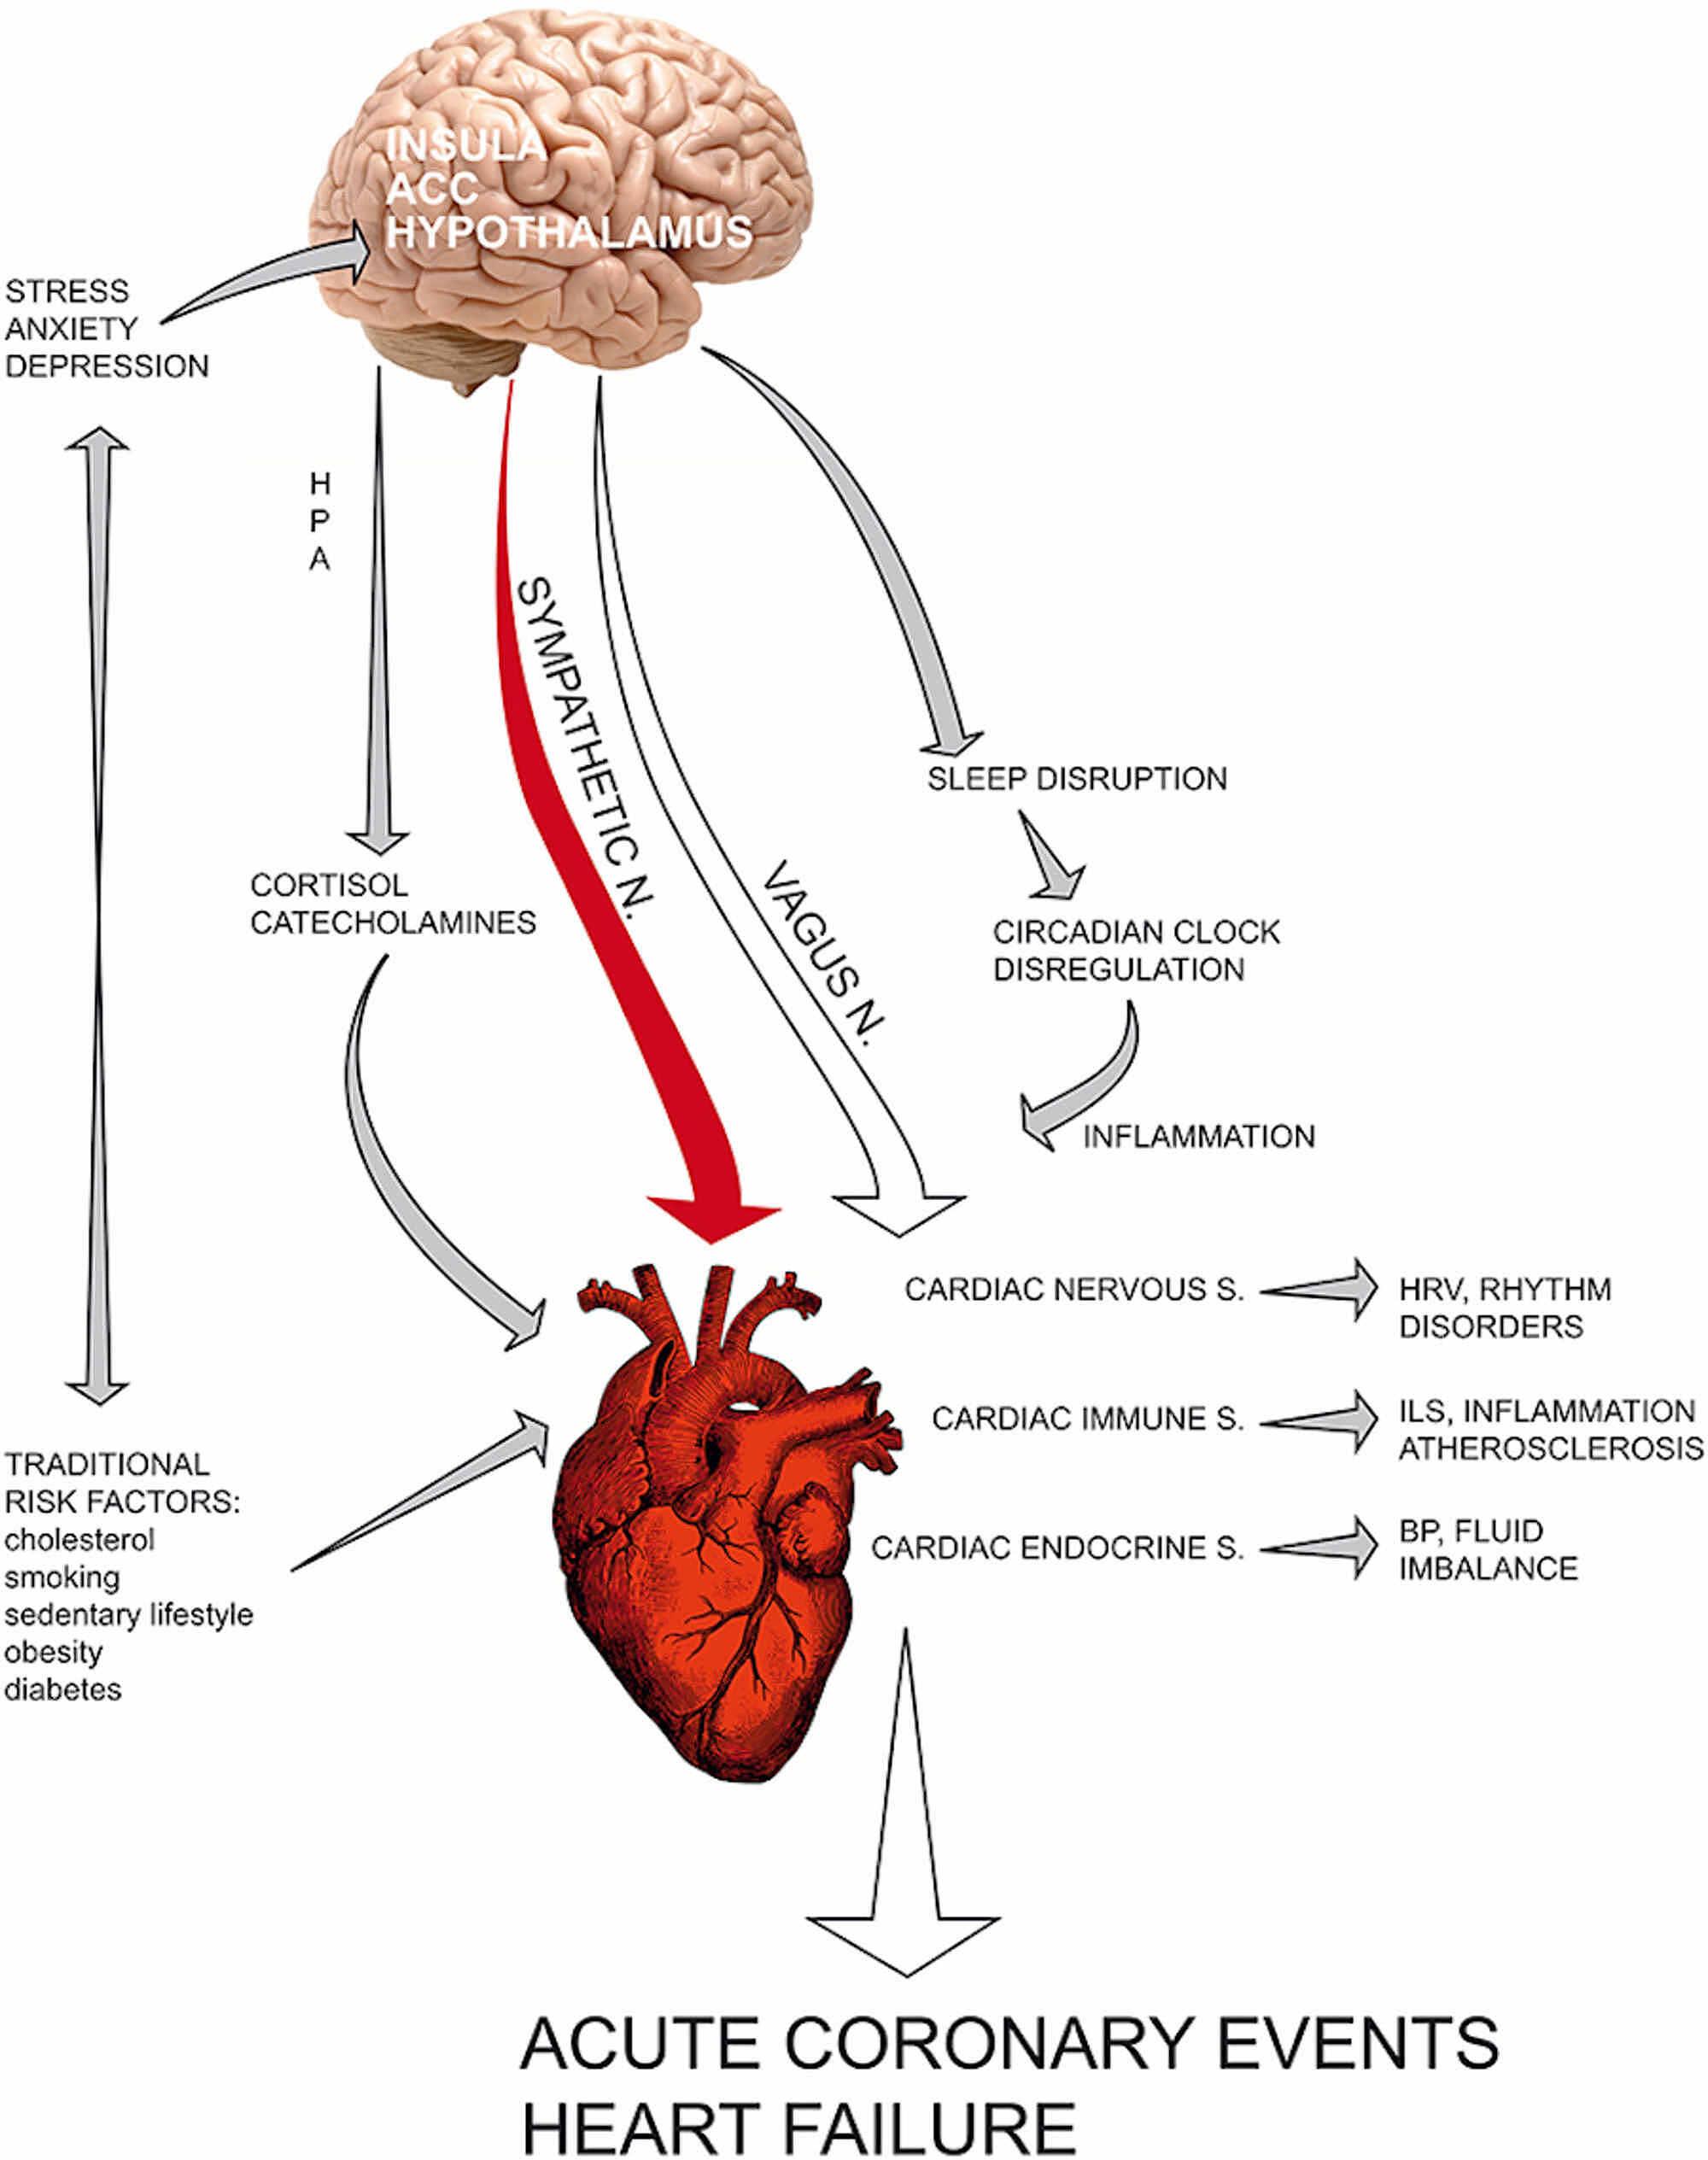 Cureus | Takotsubo Cardiomyopathy: Medical and Psychiatric Aspects